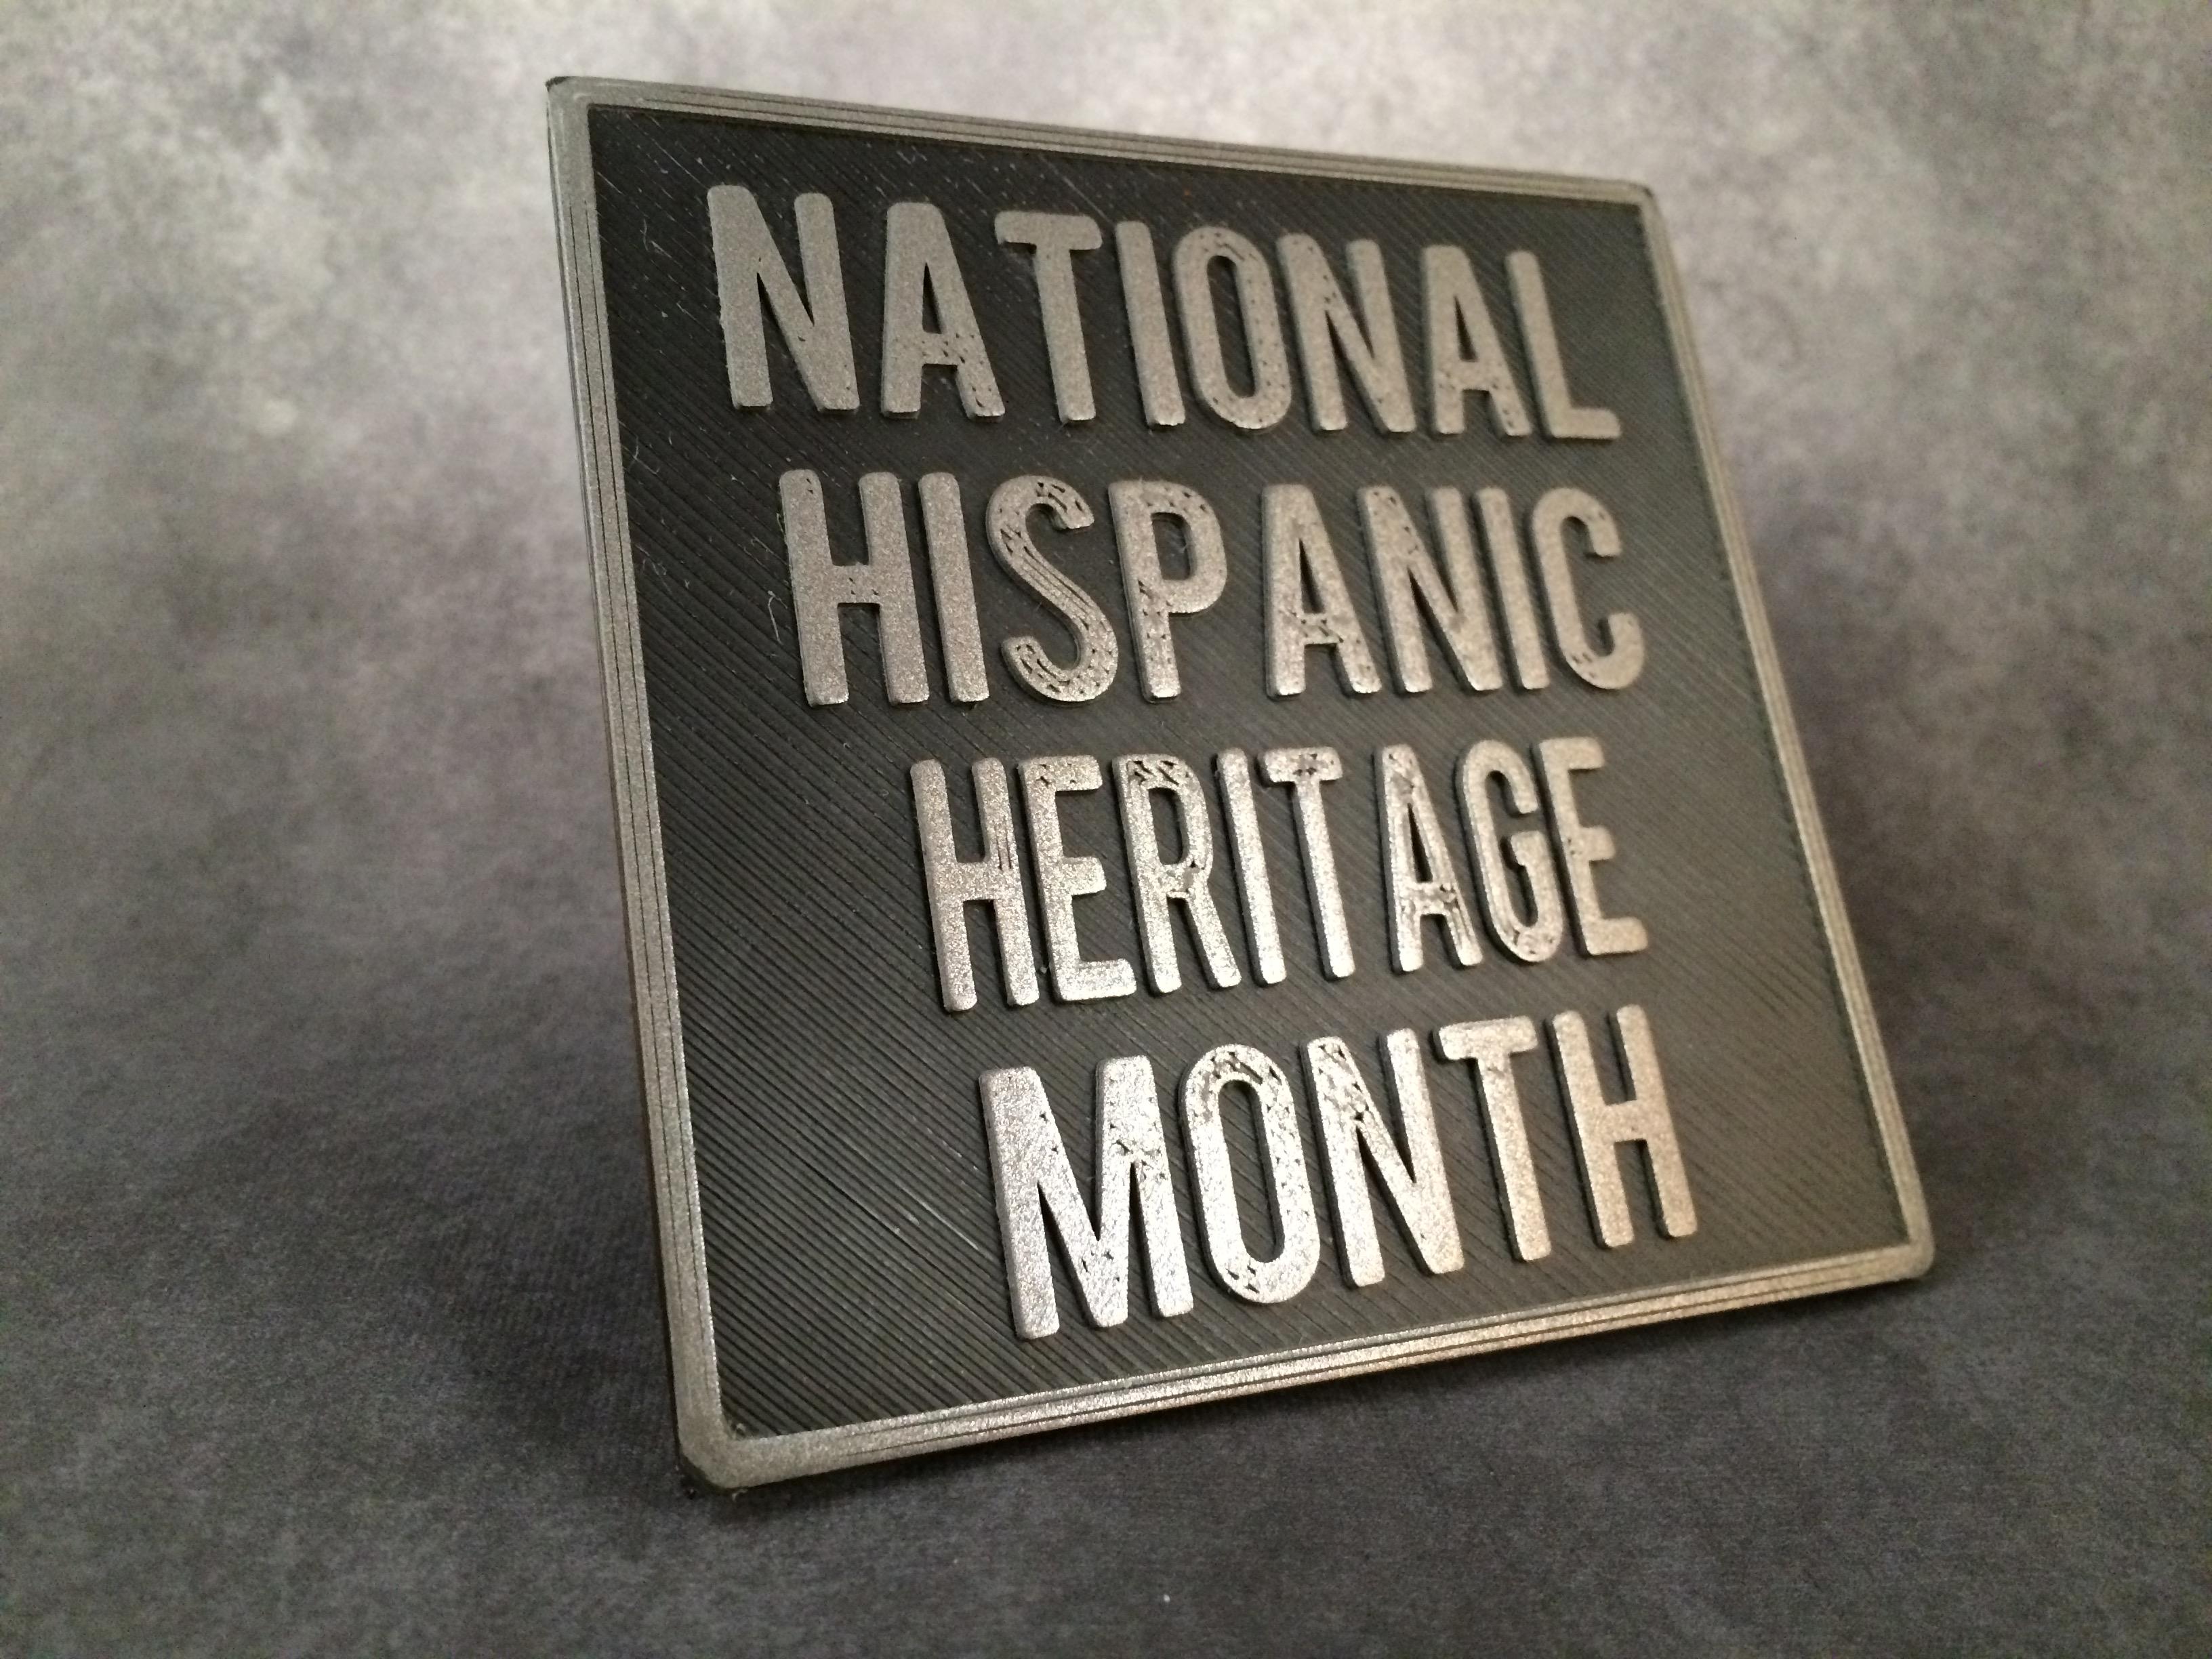 National Hispanic Heritage Month Begins